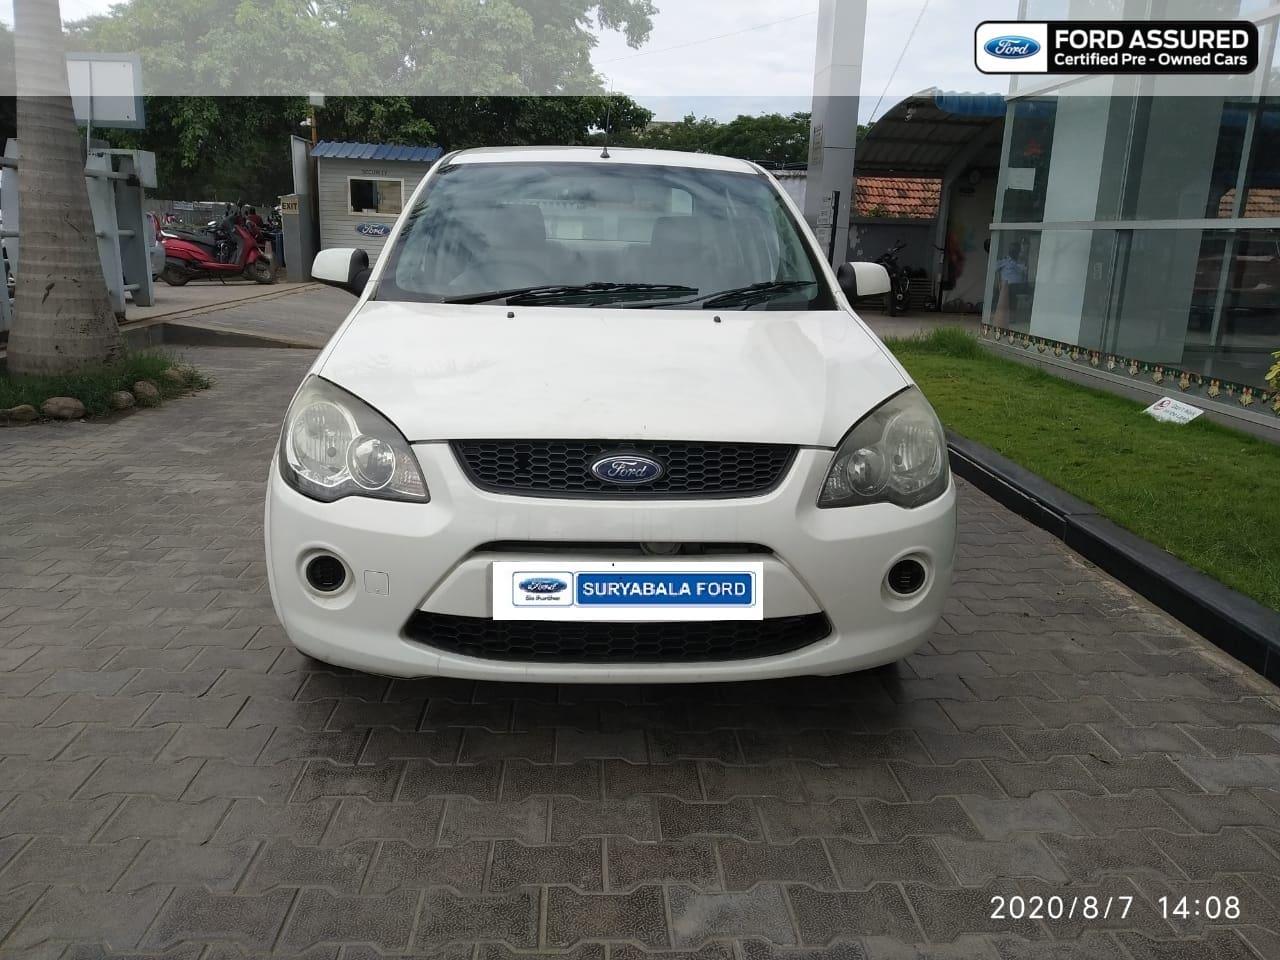 Ford Fiesta 2008-2011 1.4 ZXi TDCi LE